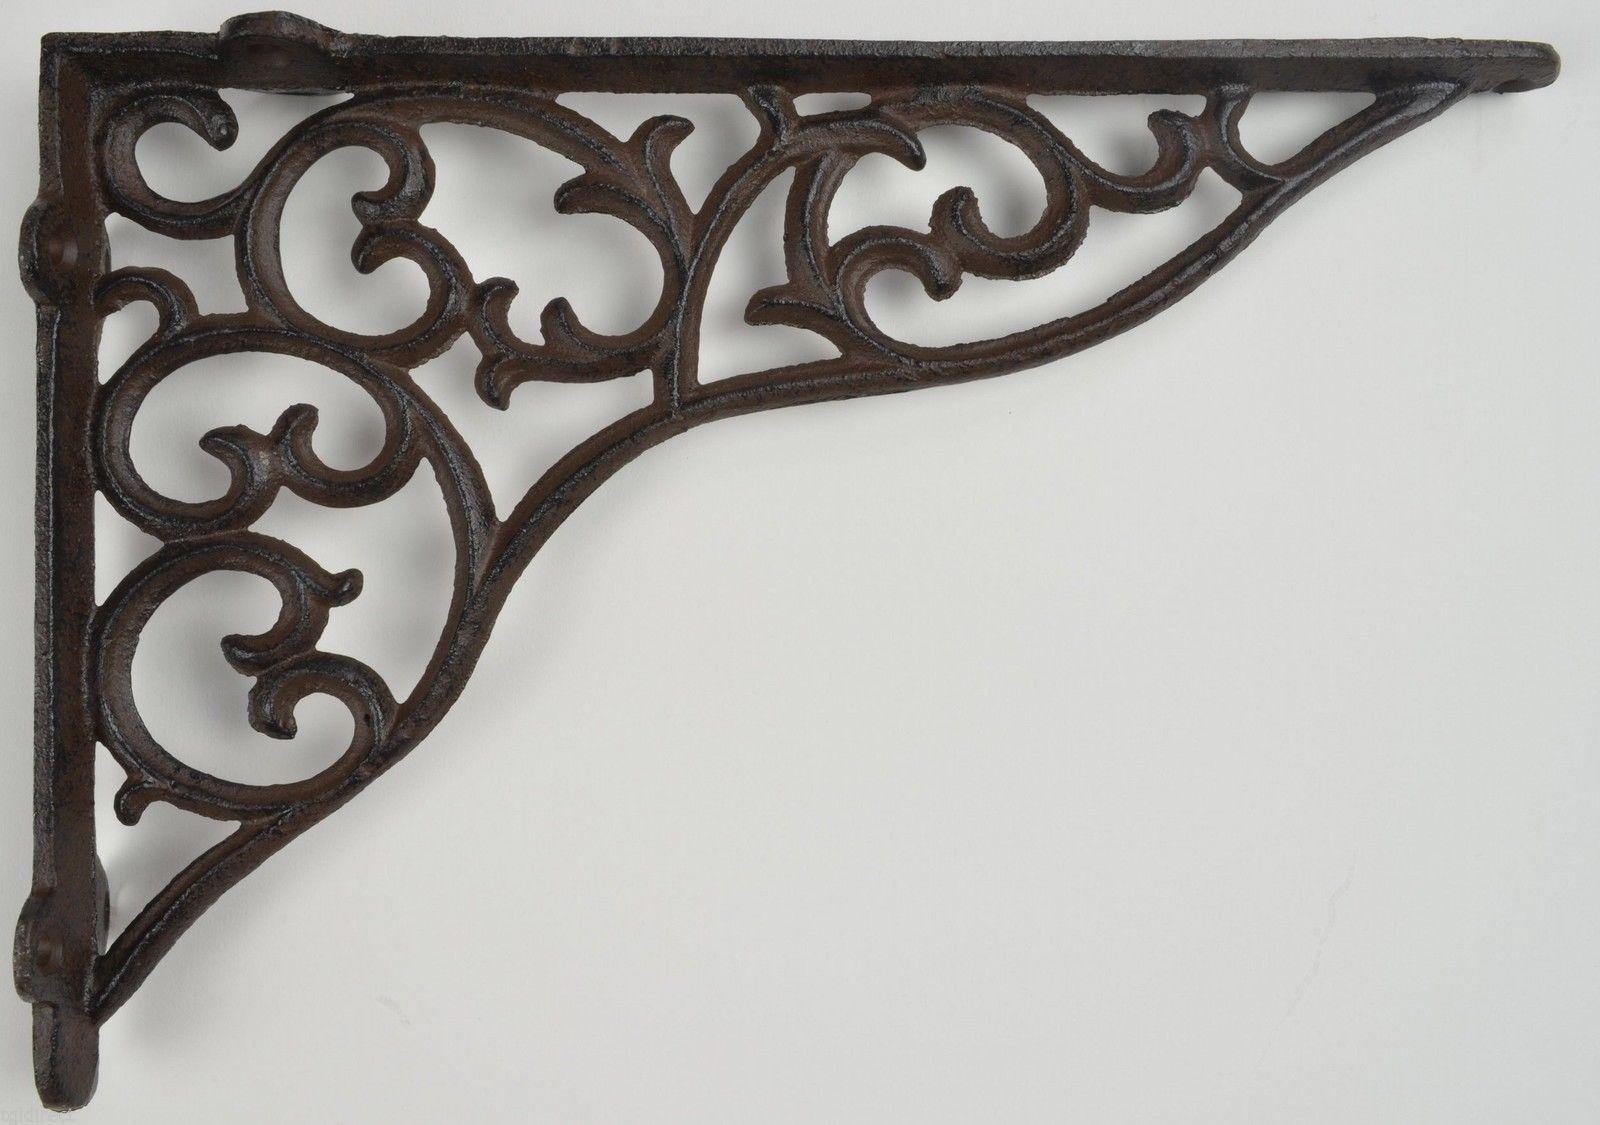 Wall Shelf Bracket Ornate Cast Iron Brace And 50 Similar Items